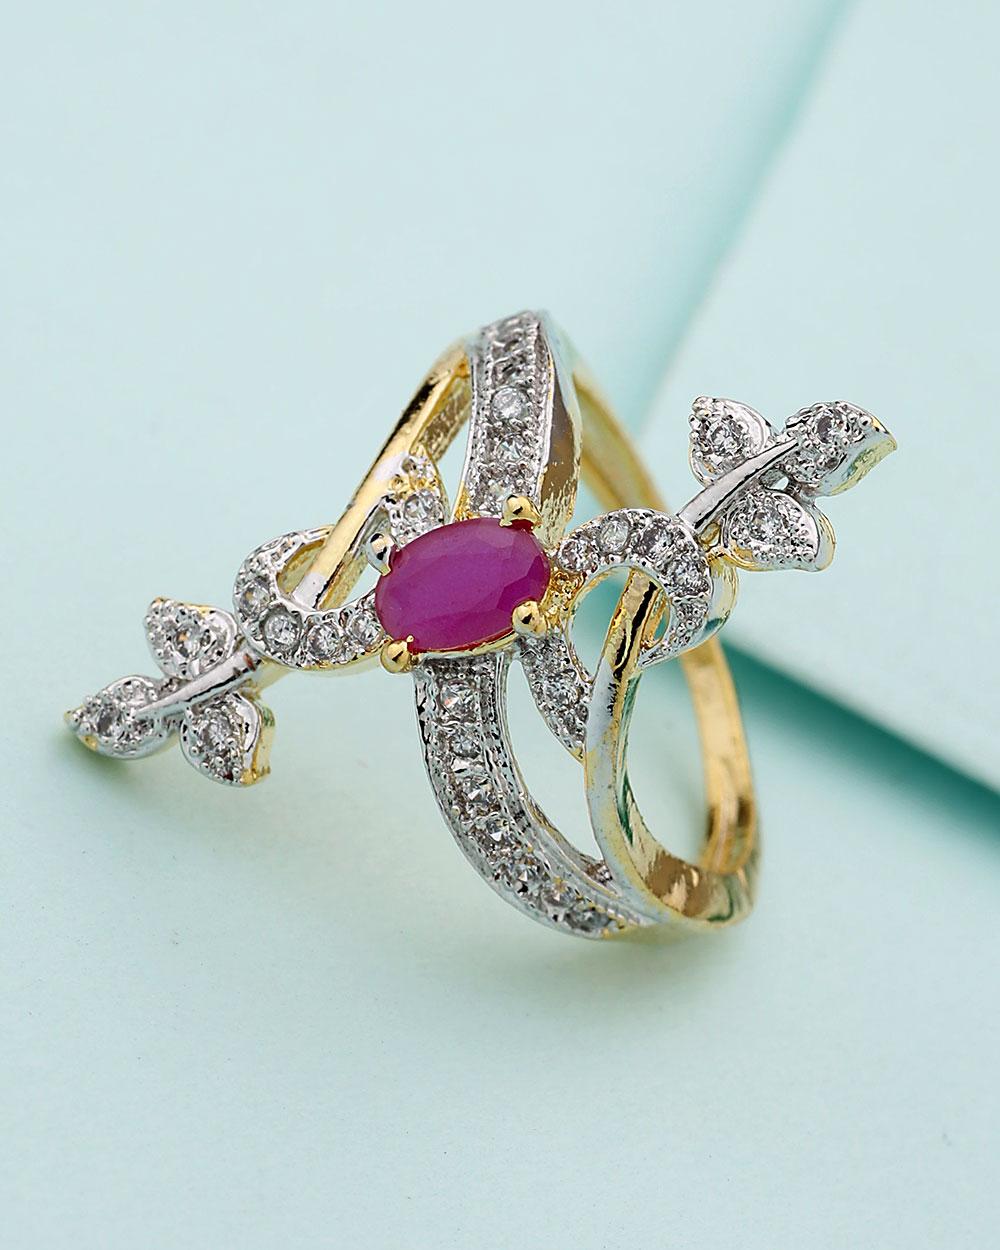 Buy Statement Finger Ring For Women Online India   Voylla